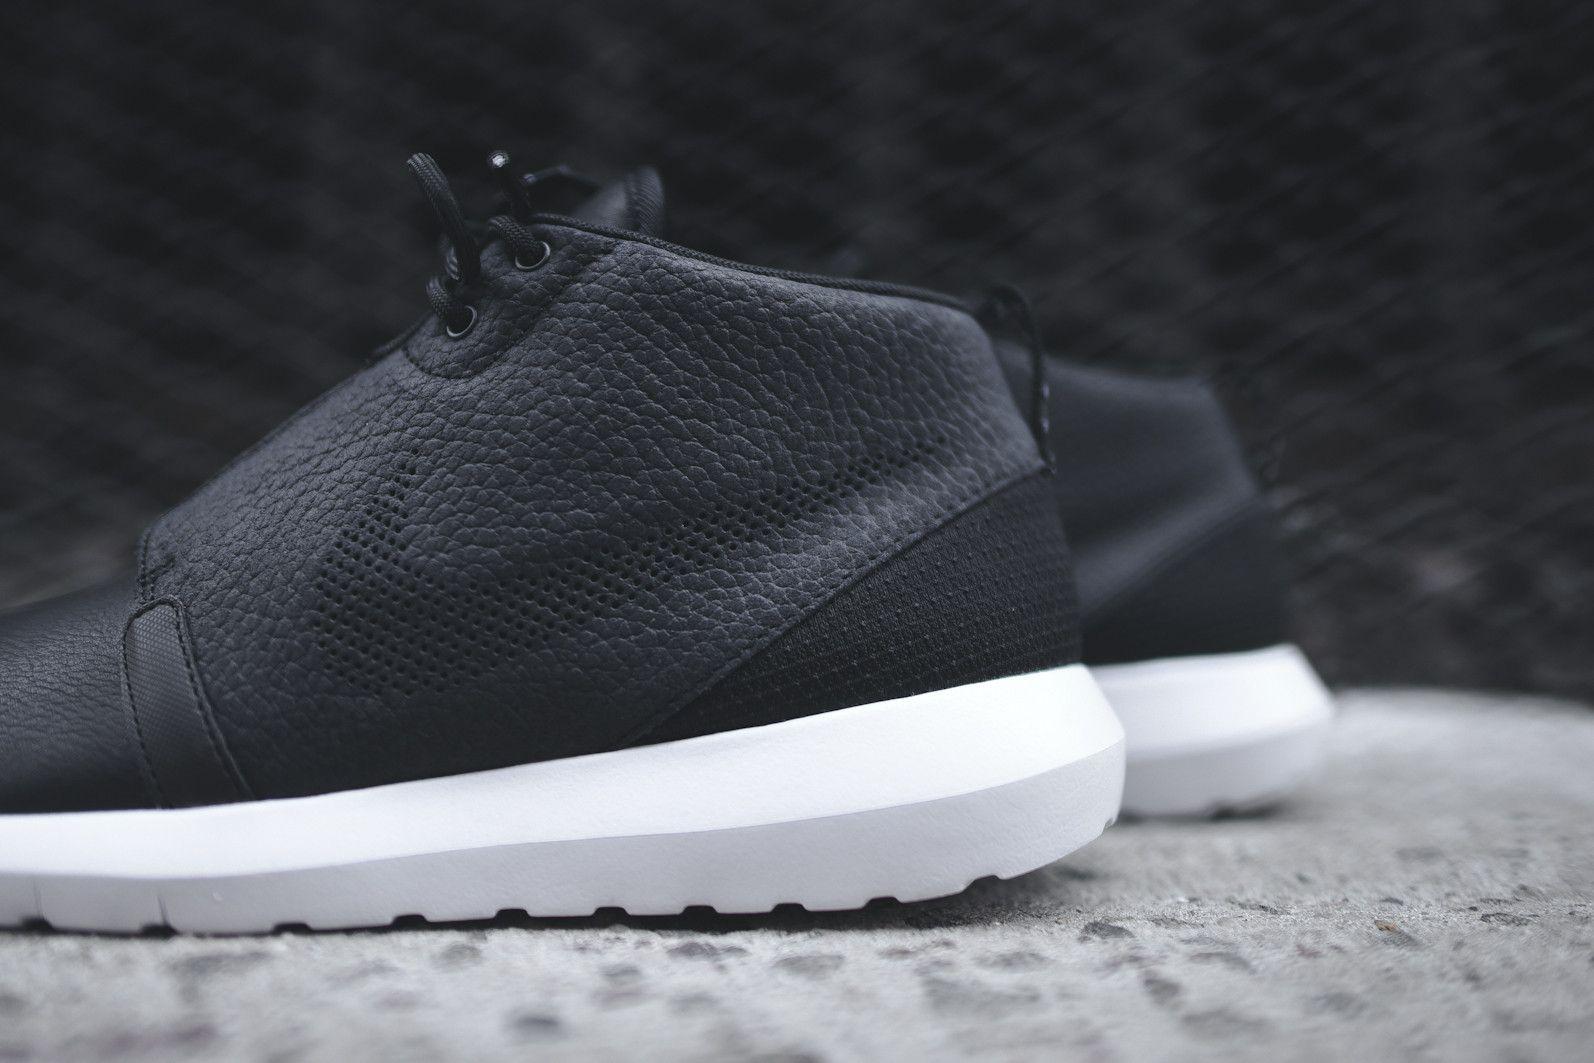 nike roshe run nm sneaker boot - black \/ dark grey \/ white bedroom